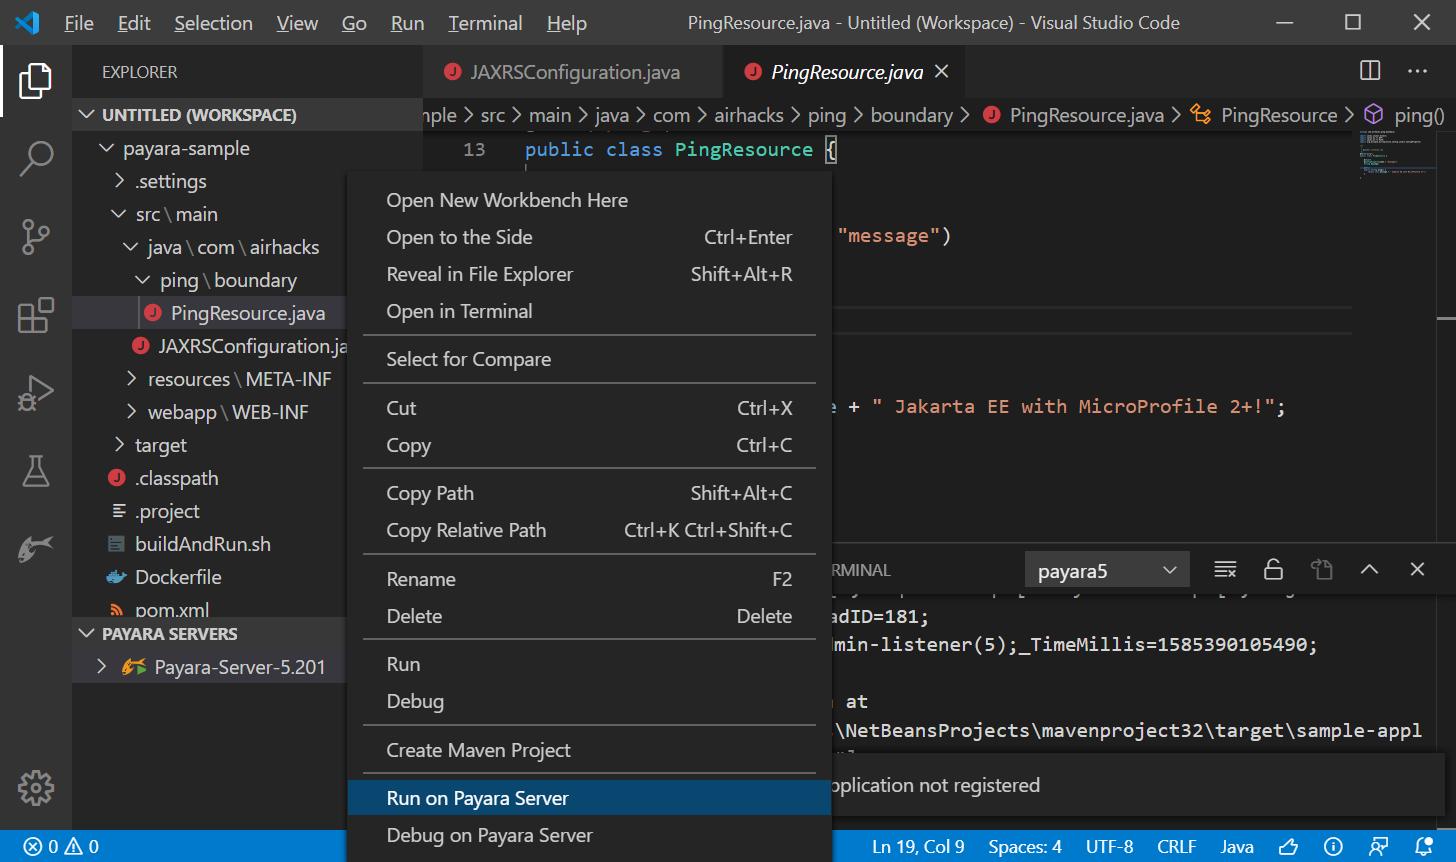 run application on payara server